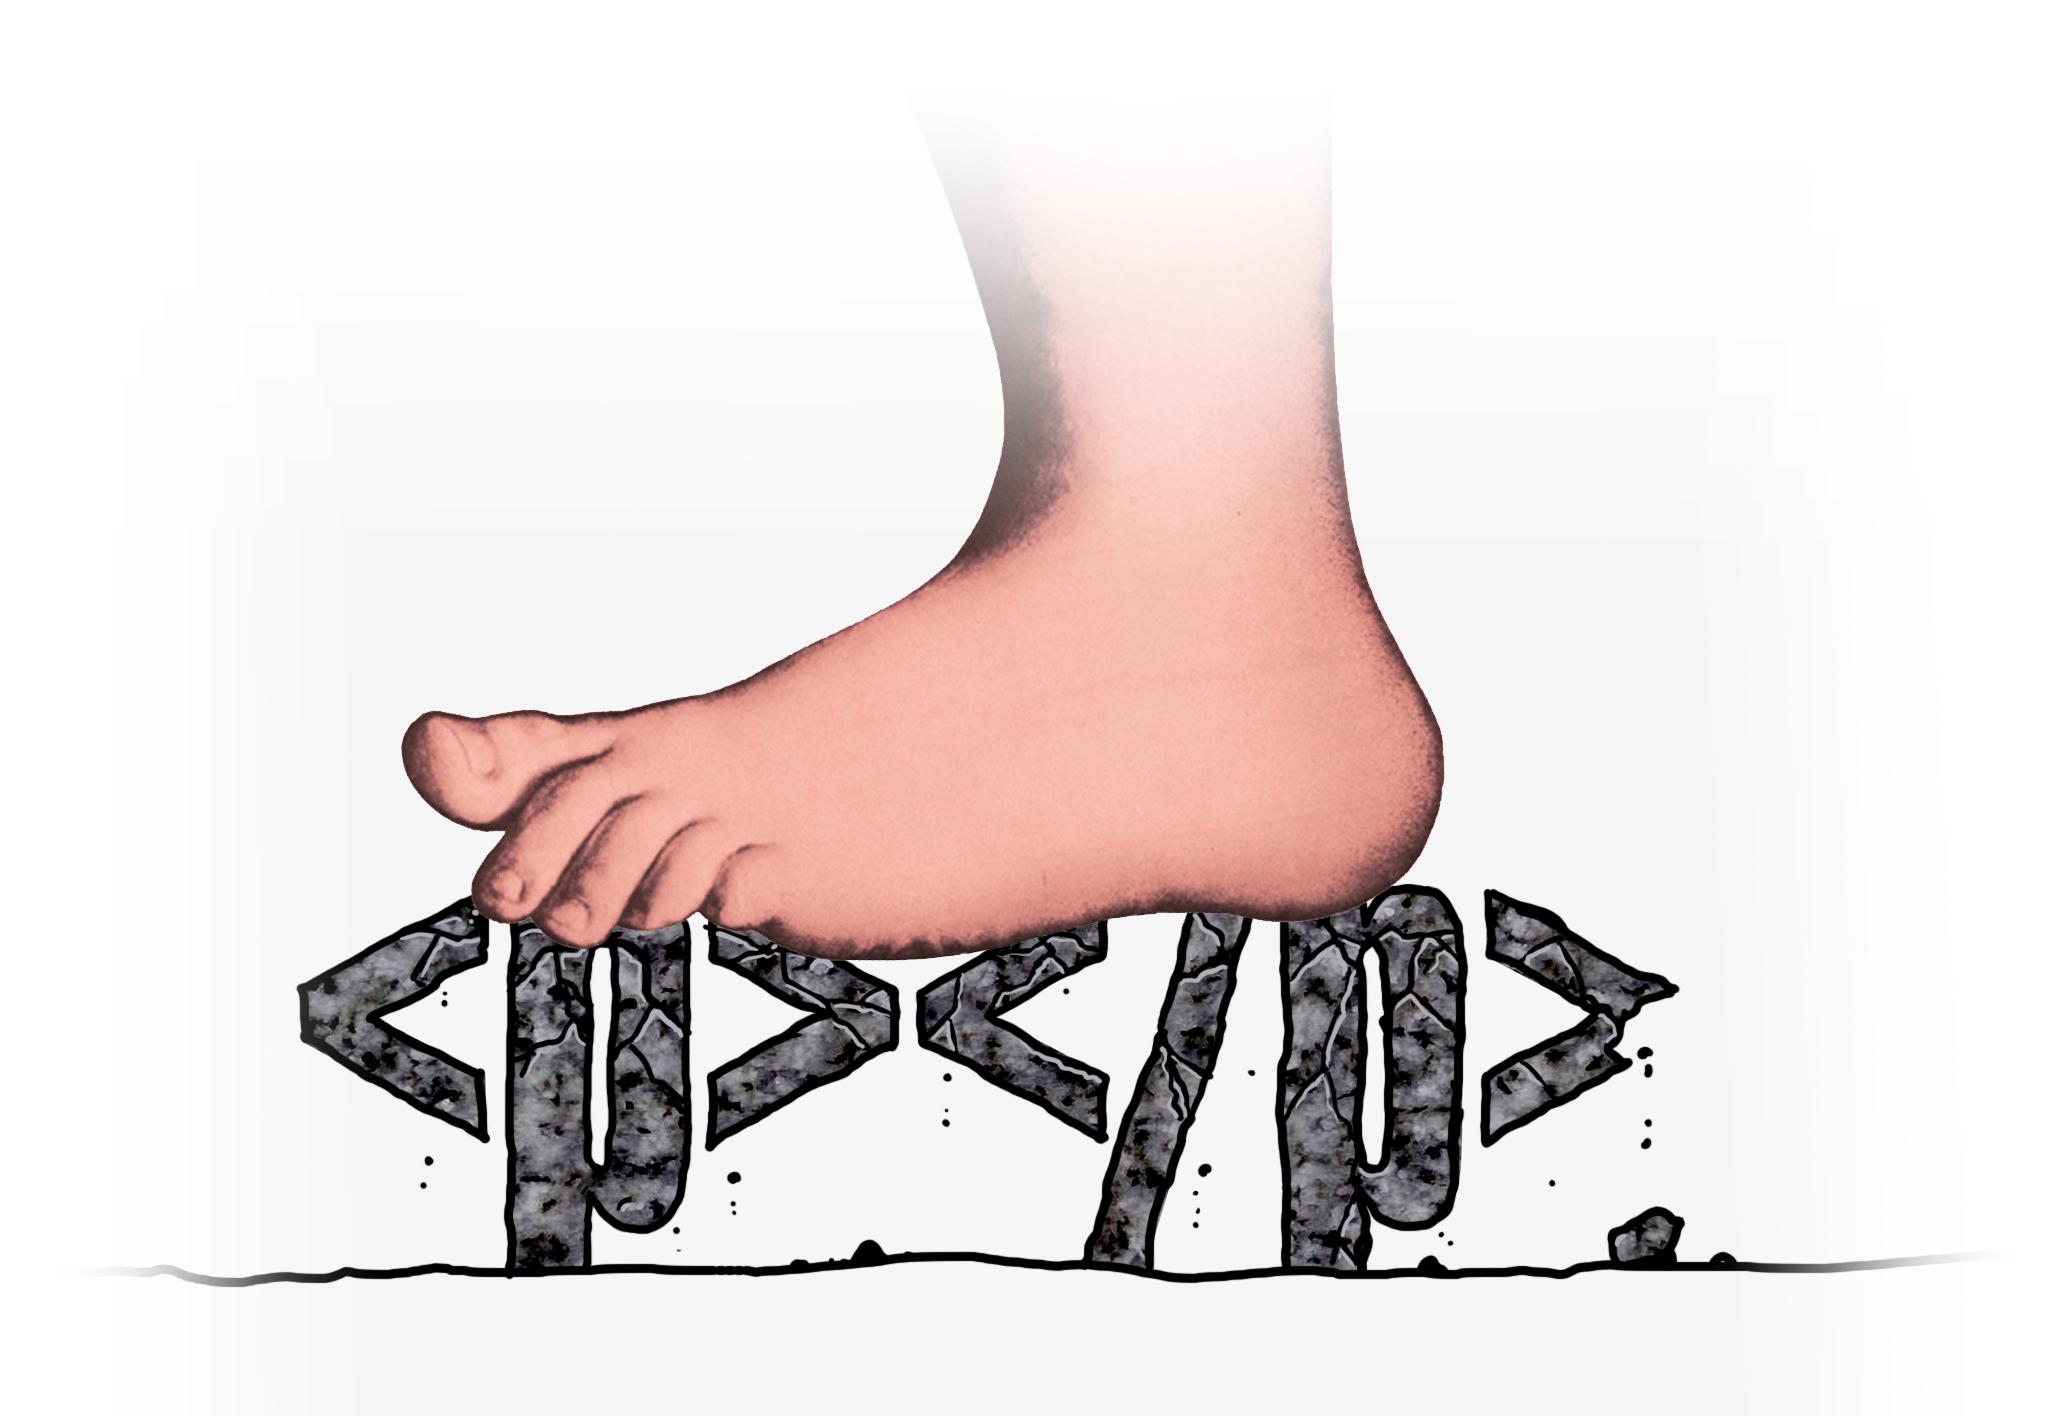 Python Foot Python's Ominous Foot